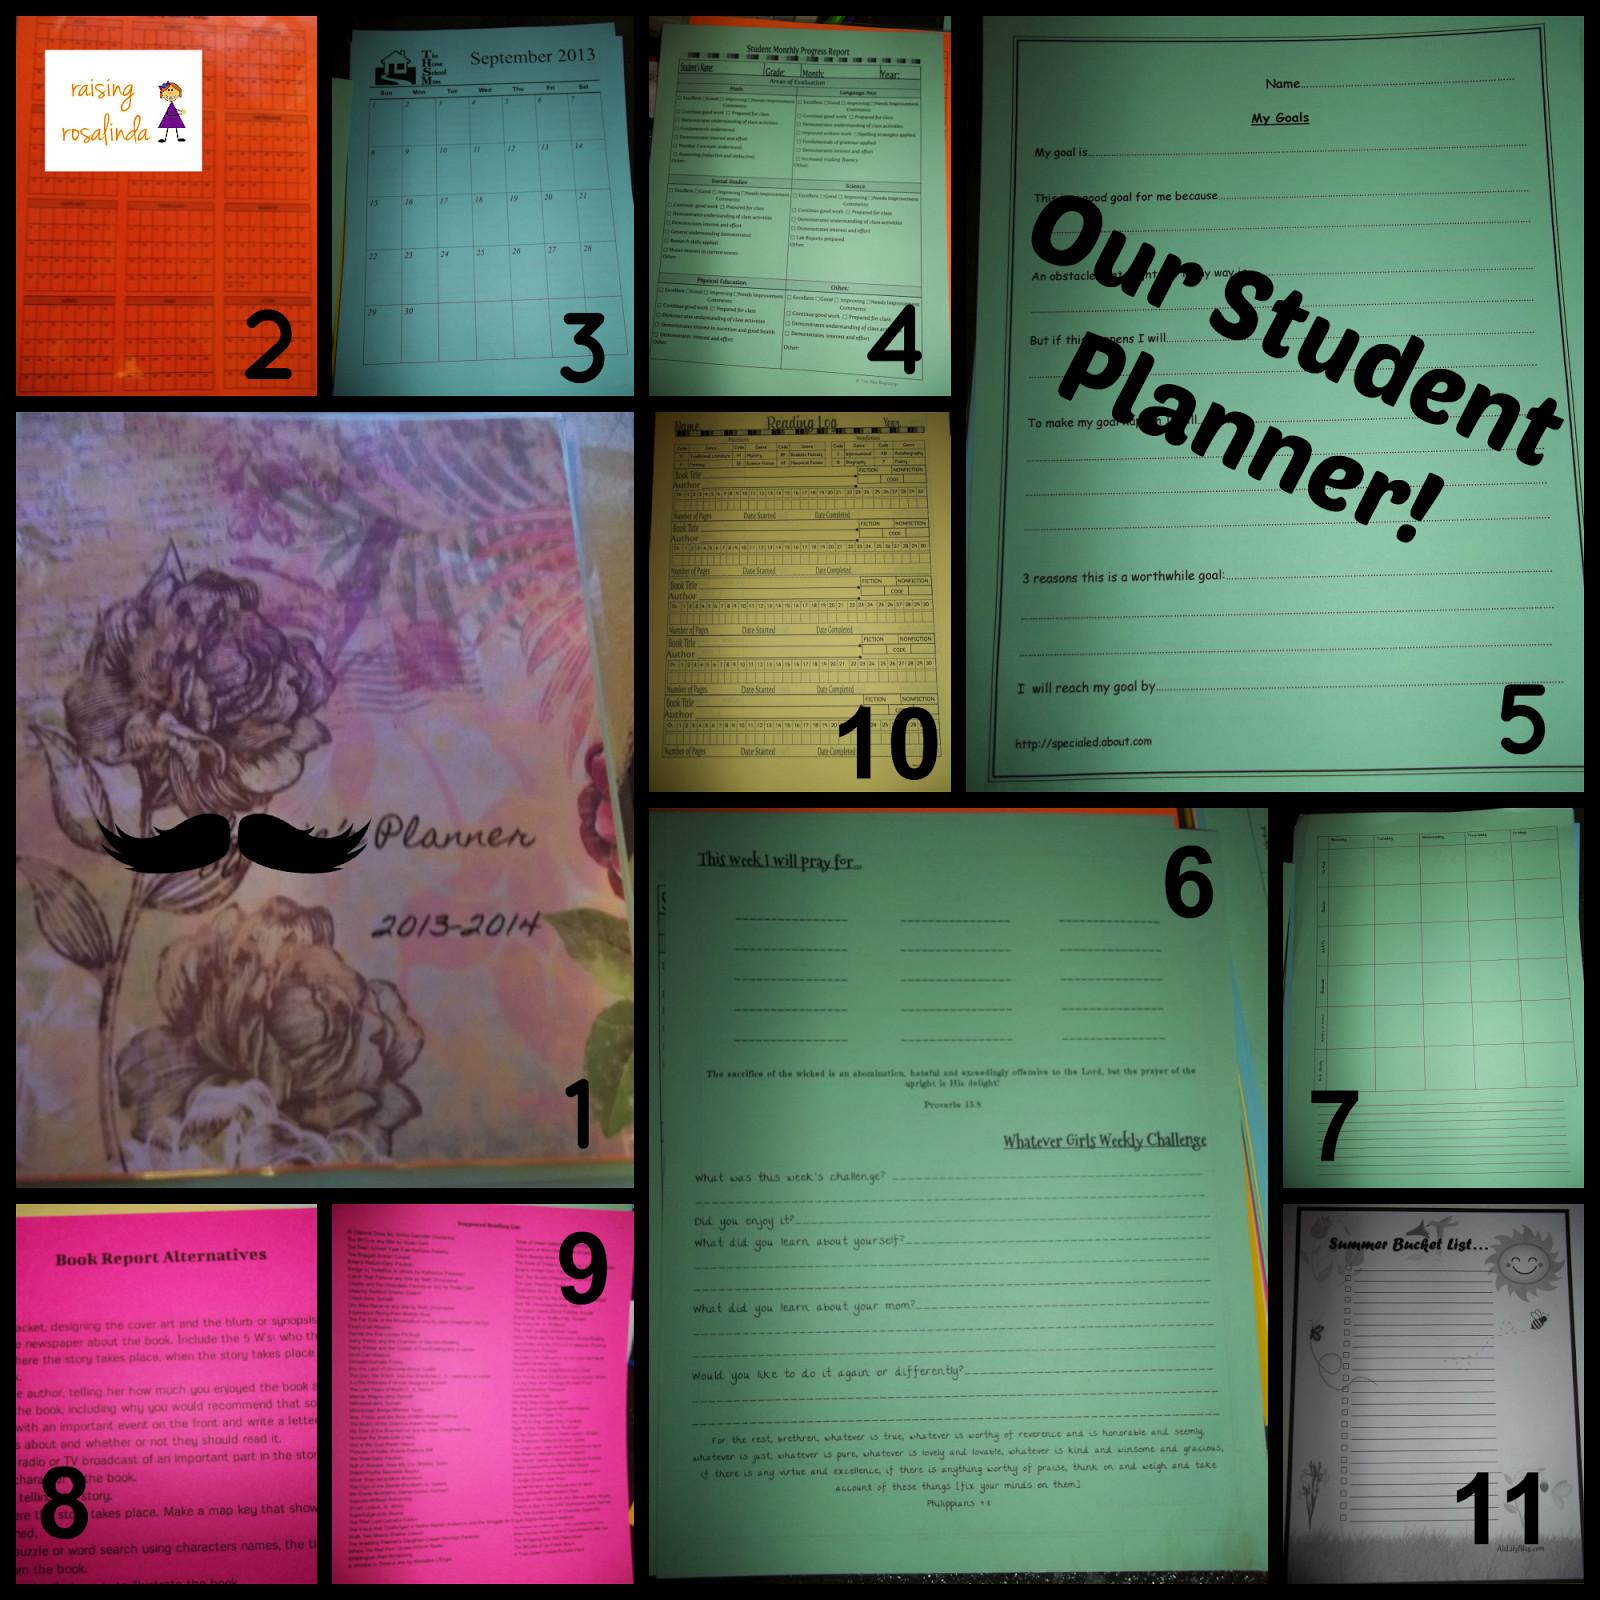 DIY School Planner  Raising Rosalinda Our DIY Student Planner